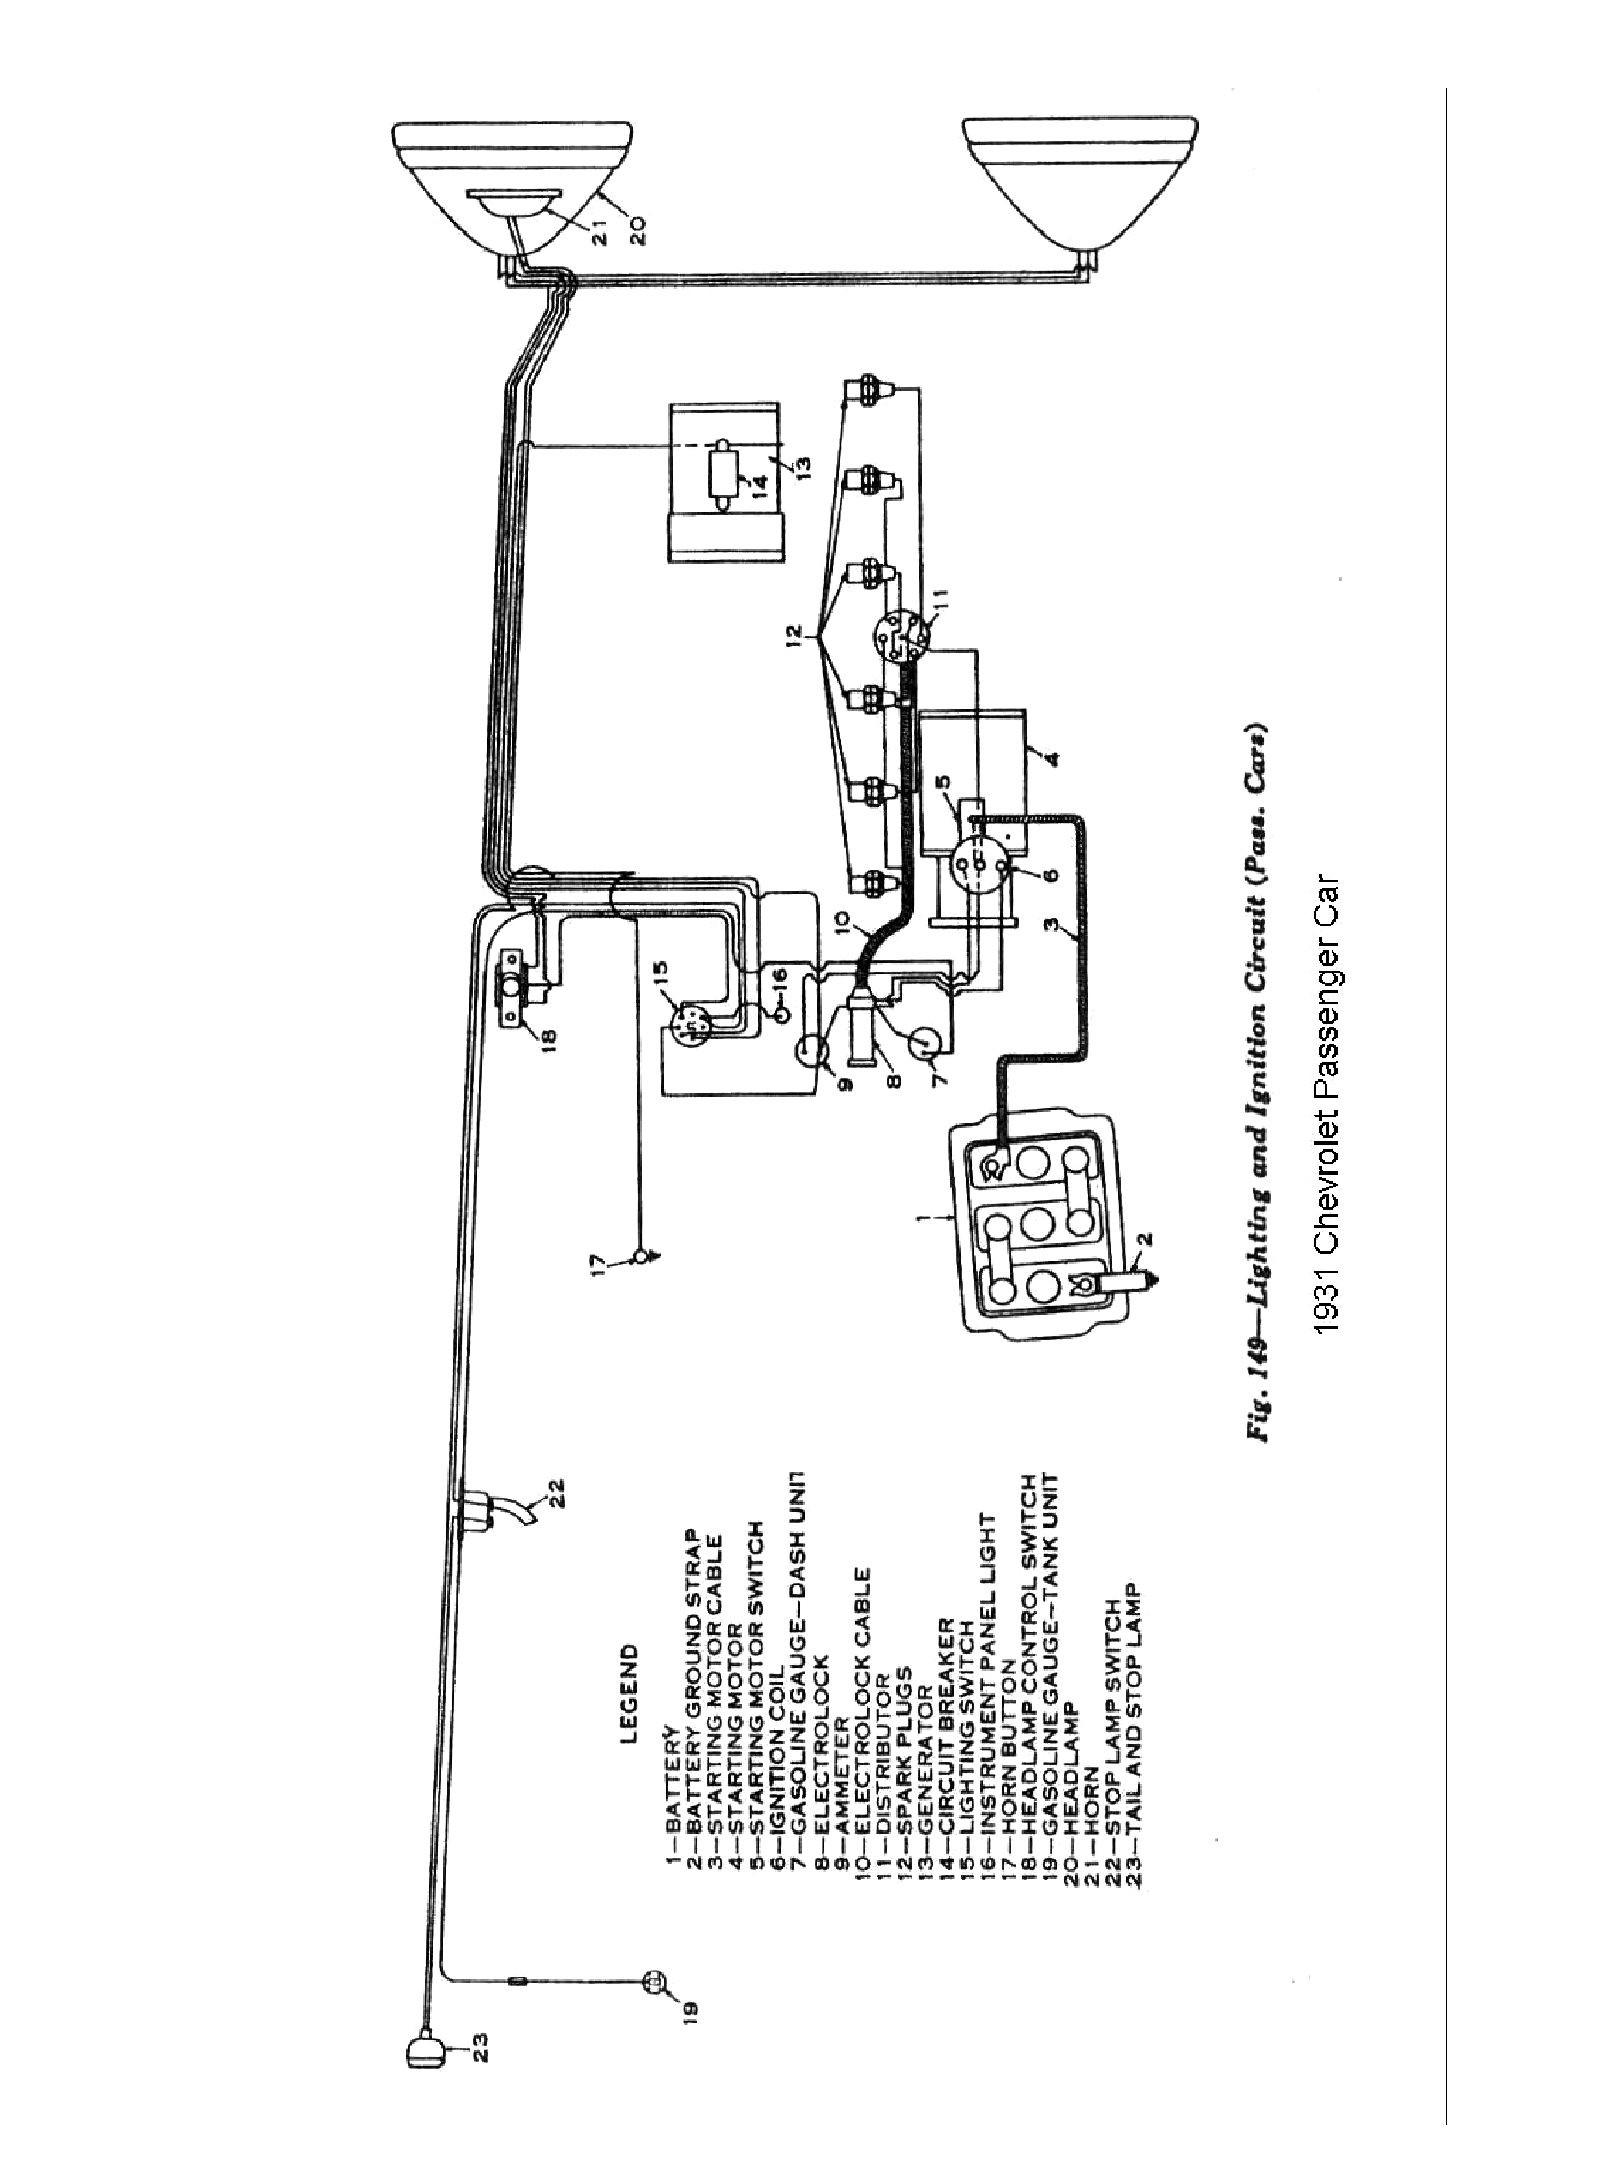 fiberform boat electrical wiring diagram wiring diagram Tracker Boat Electrical Diagrams fiberform boat electrical wiring diagram wiring diagram libraryregal boat wiring diagram wiring diagram explainedpro line boats